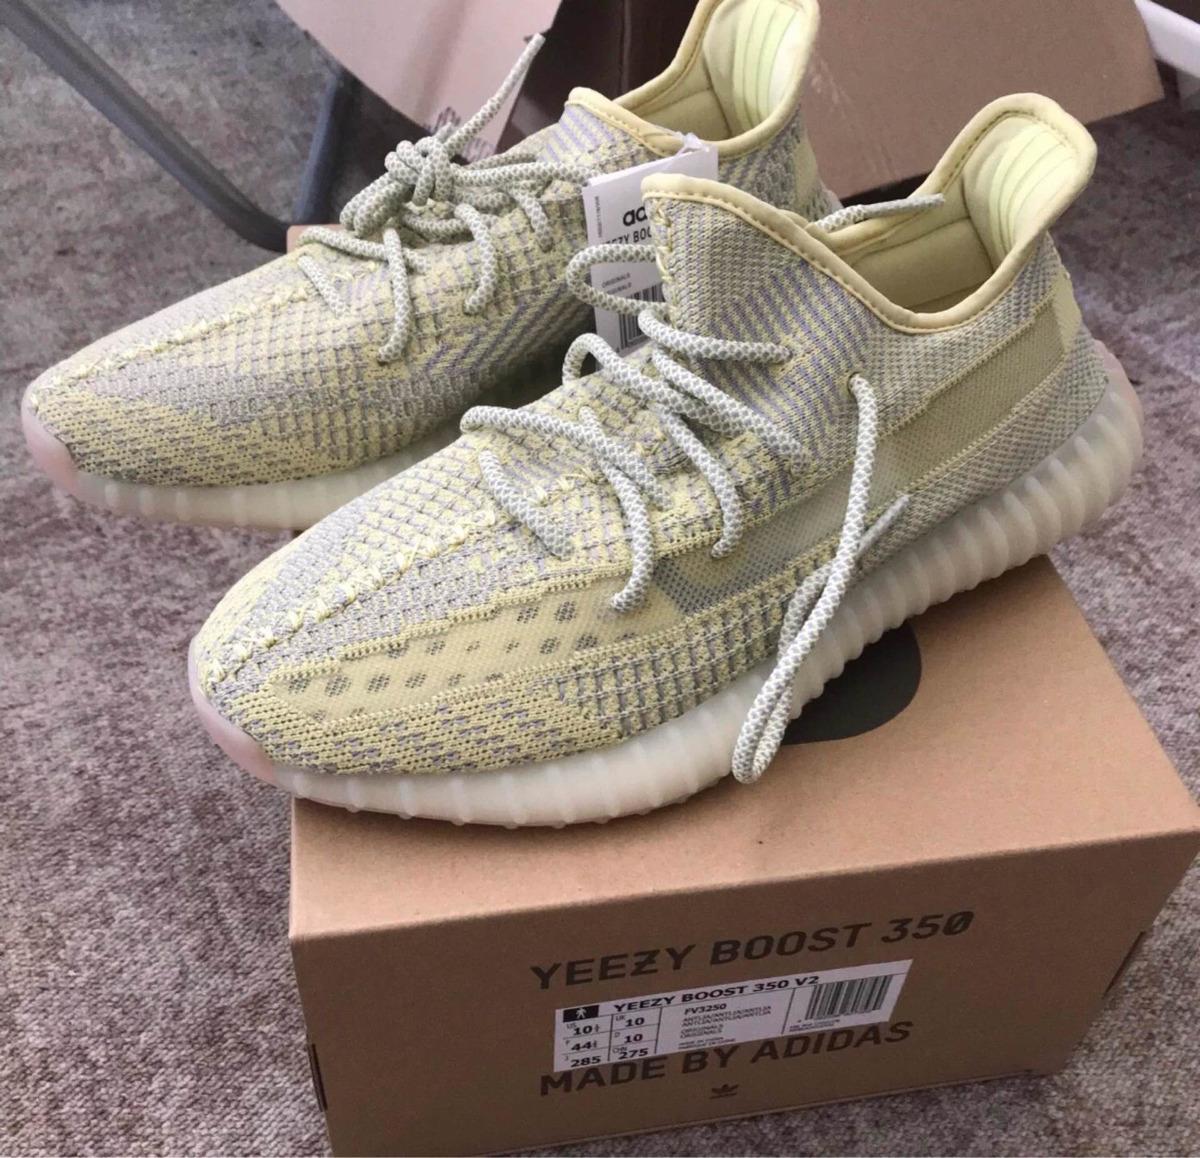 adidas Yeezy Boost 350 V2 Antlia Non Reflective   Kixify